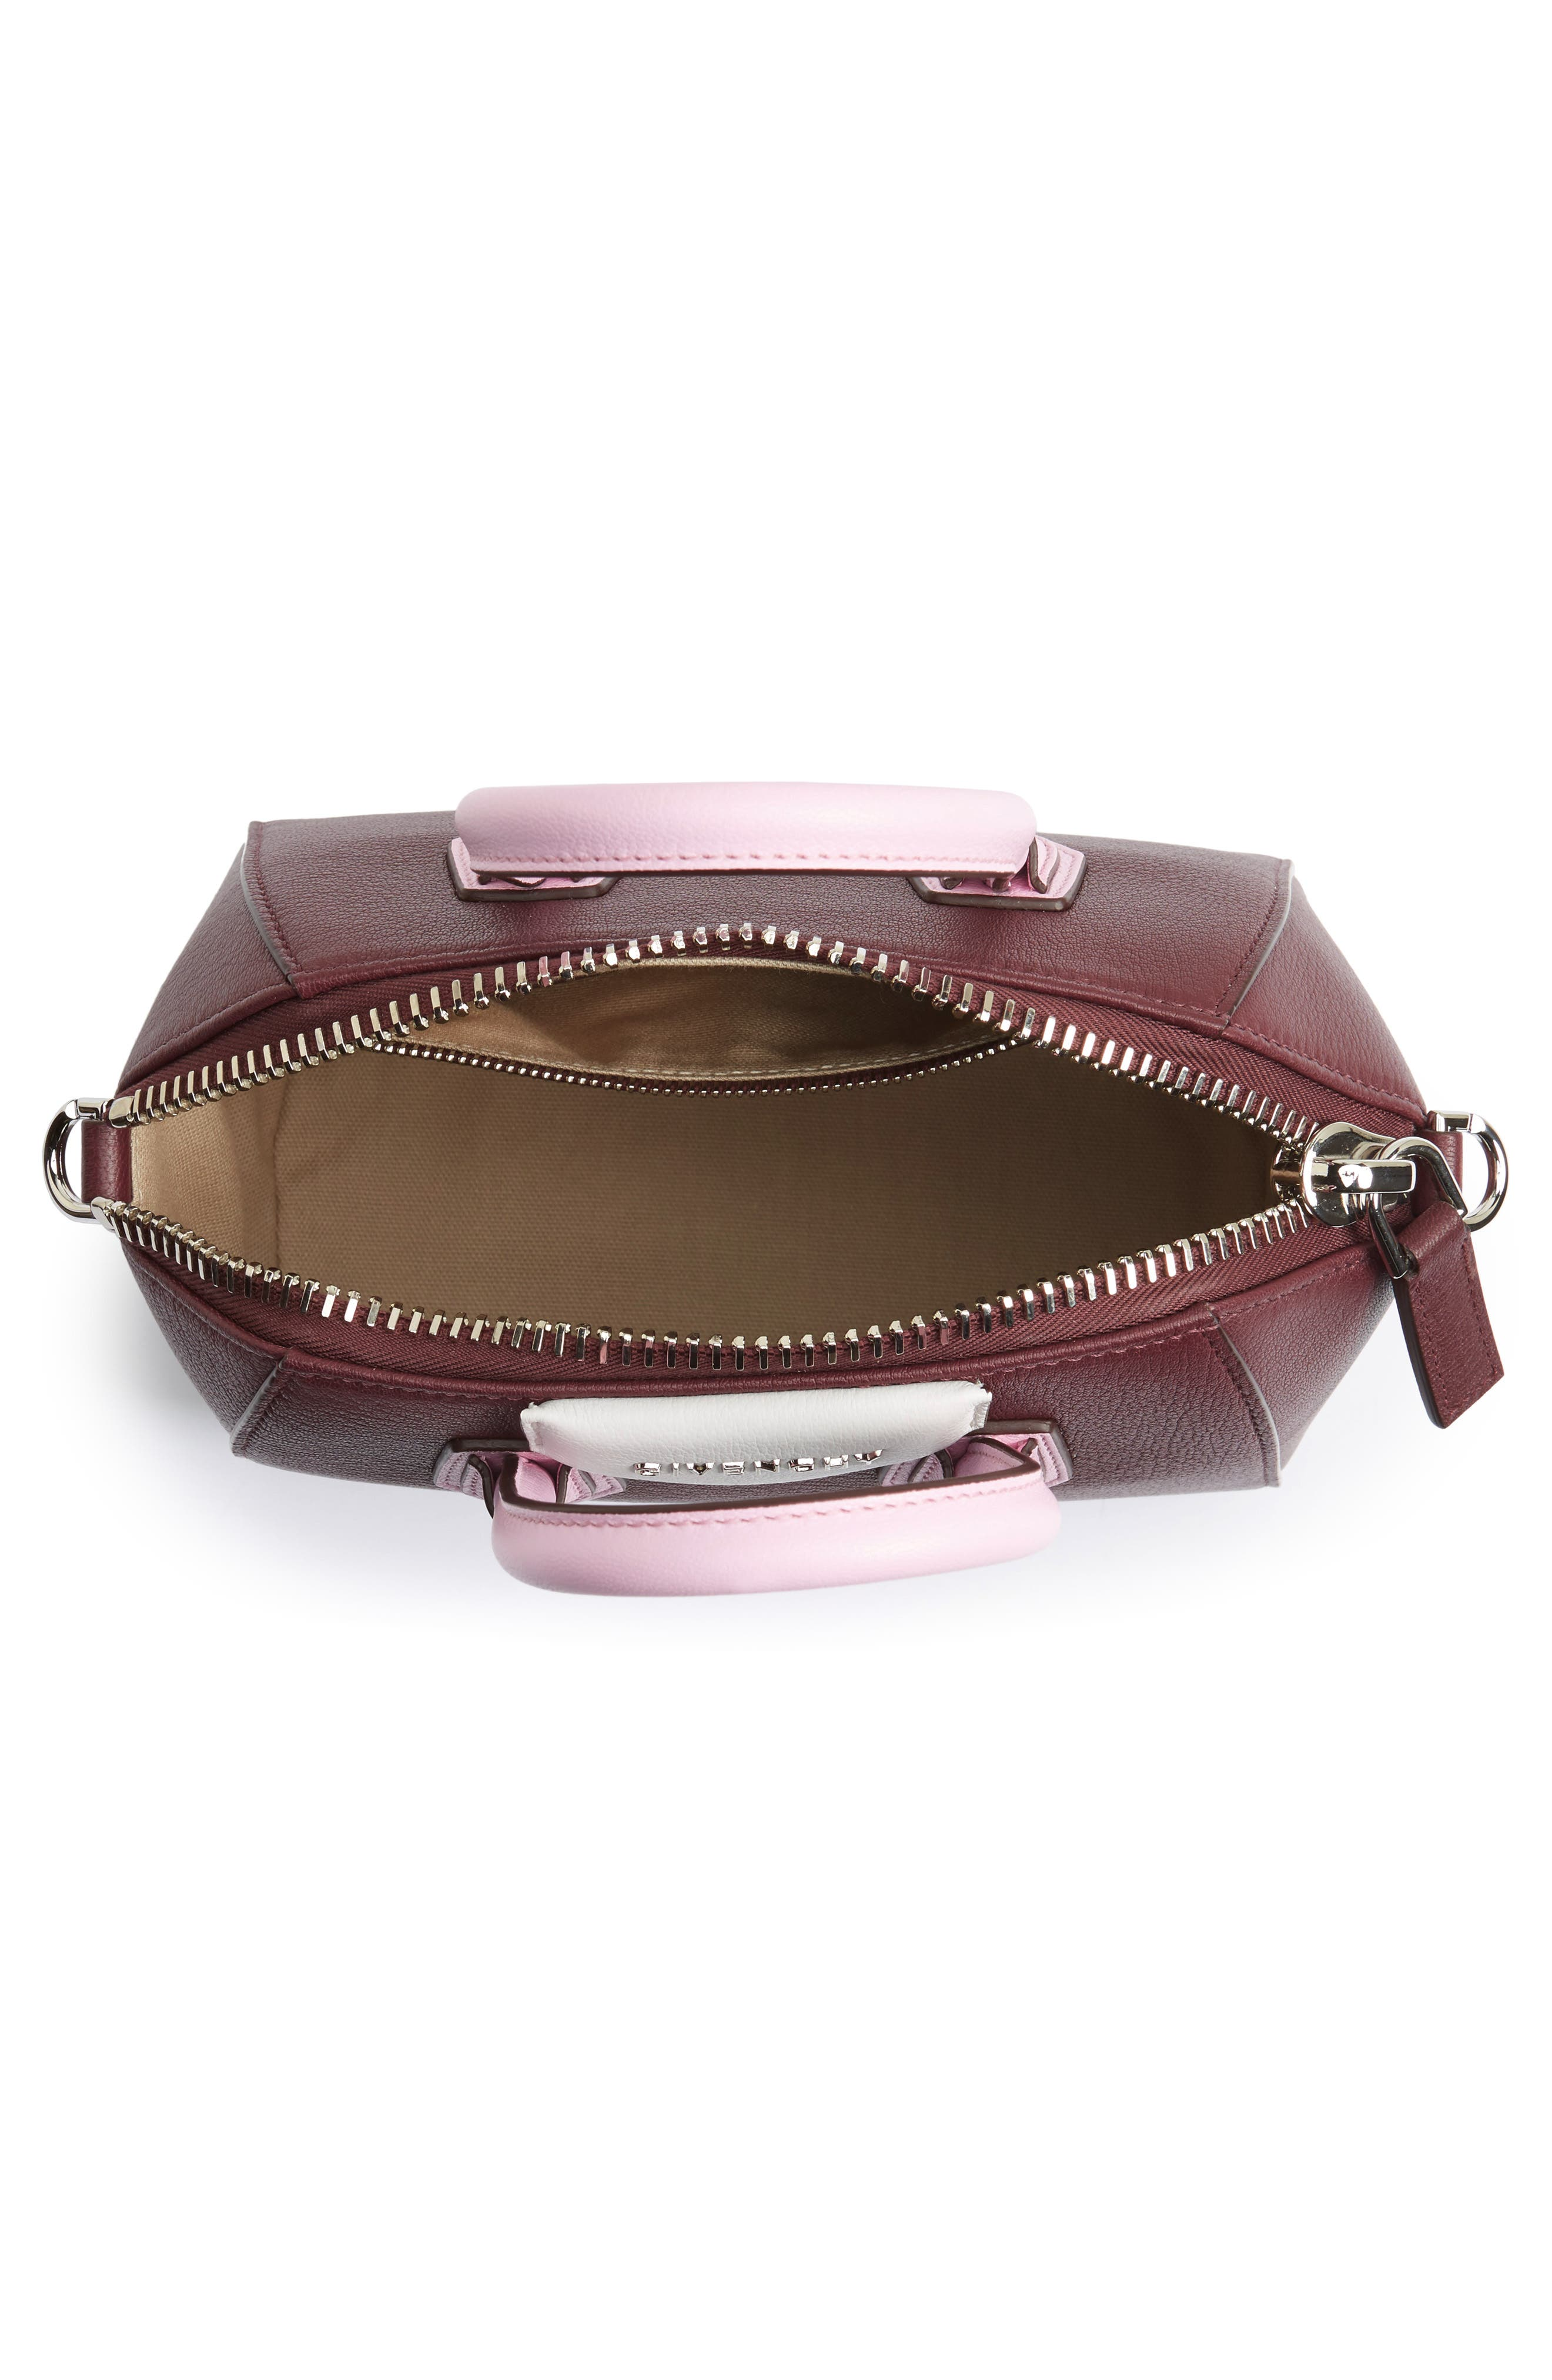 Mini Antigona Leather Top Handle Satchel,                             Alternate thumbnail 4, color,                             Burgundy/ Pink